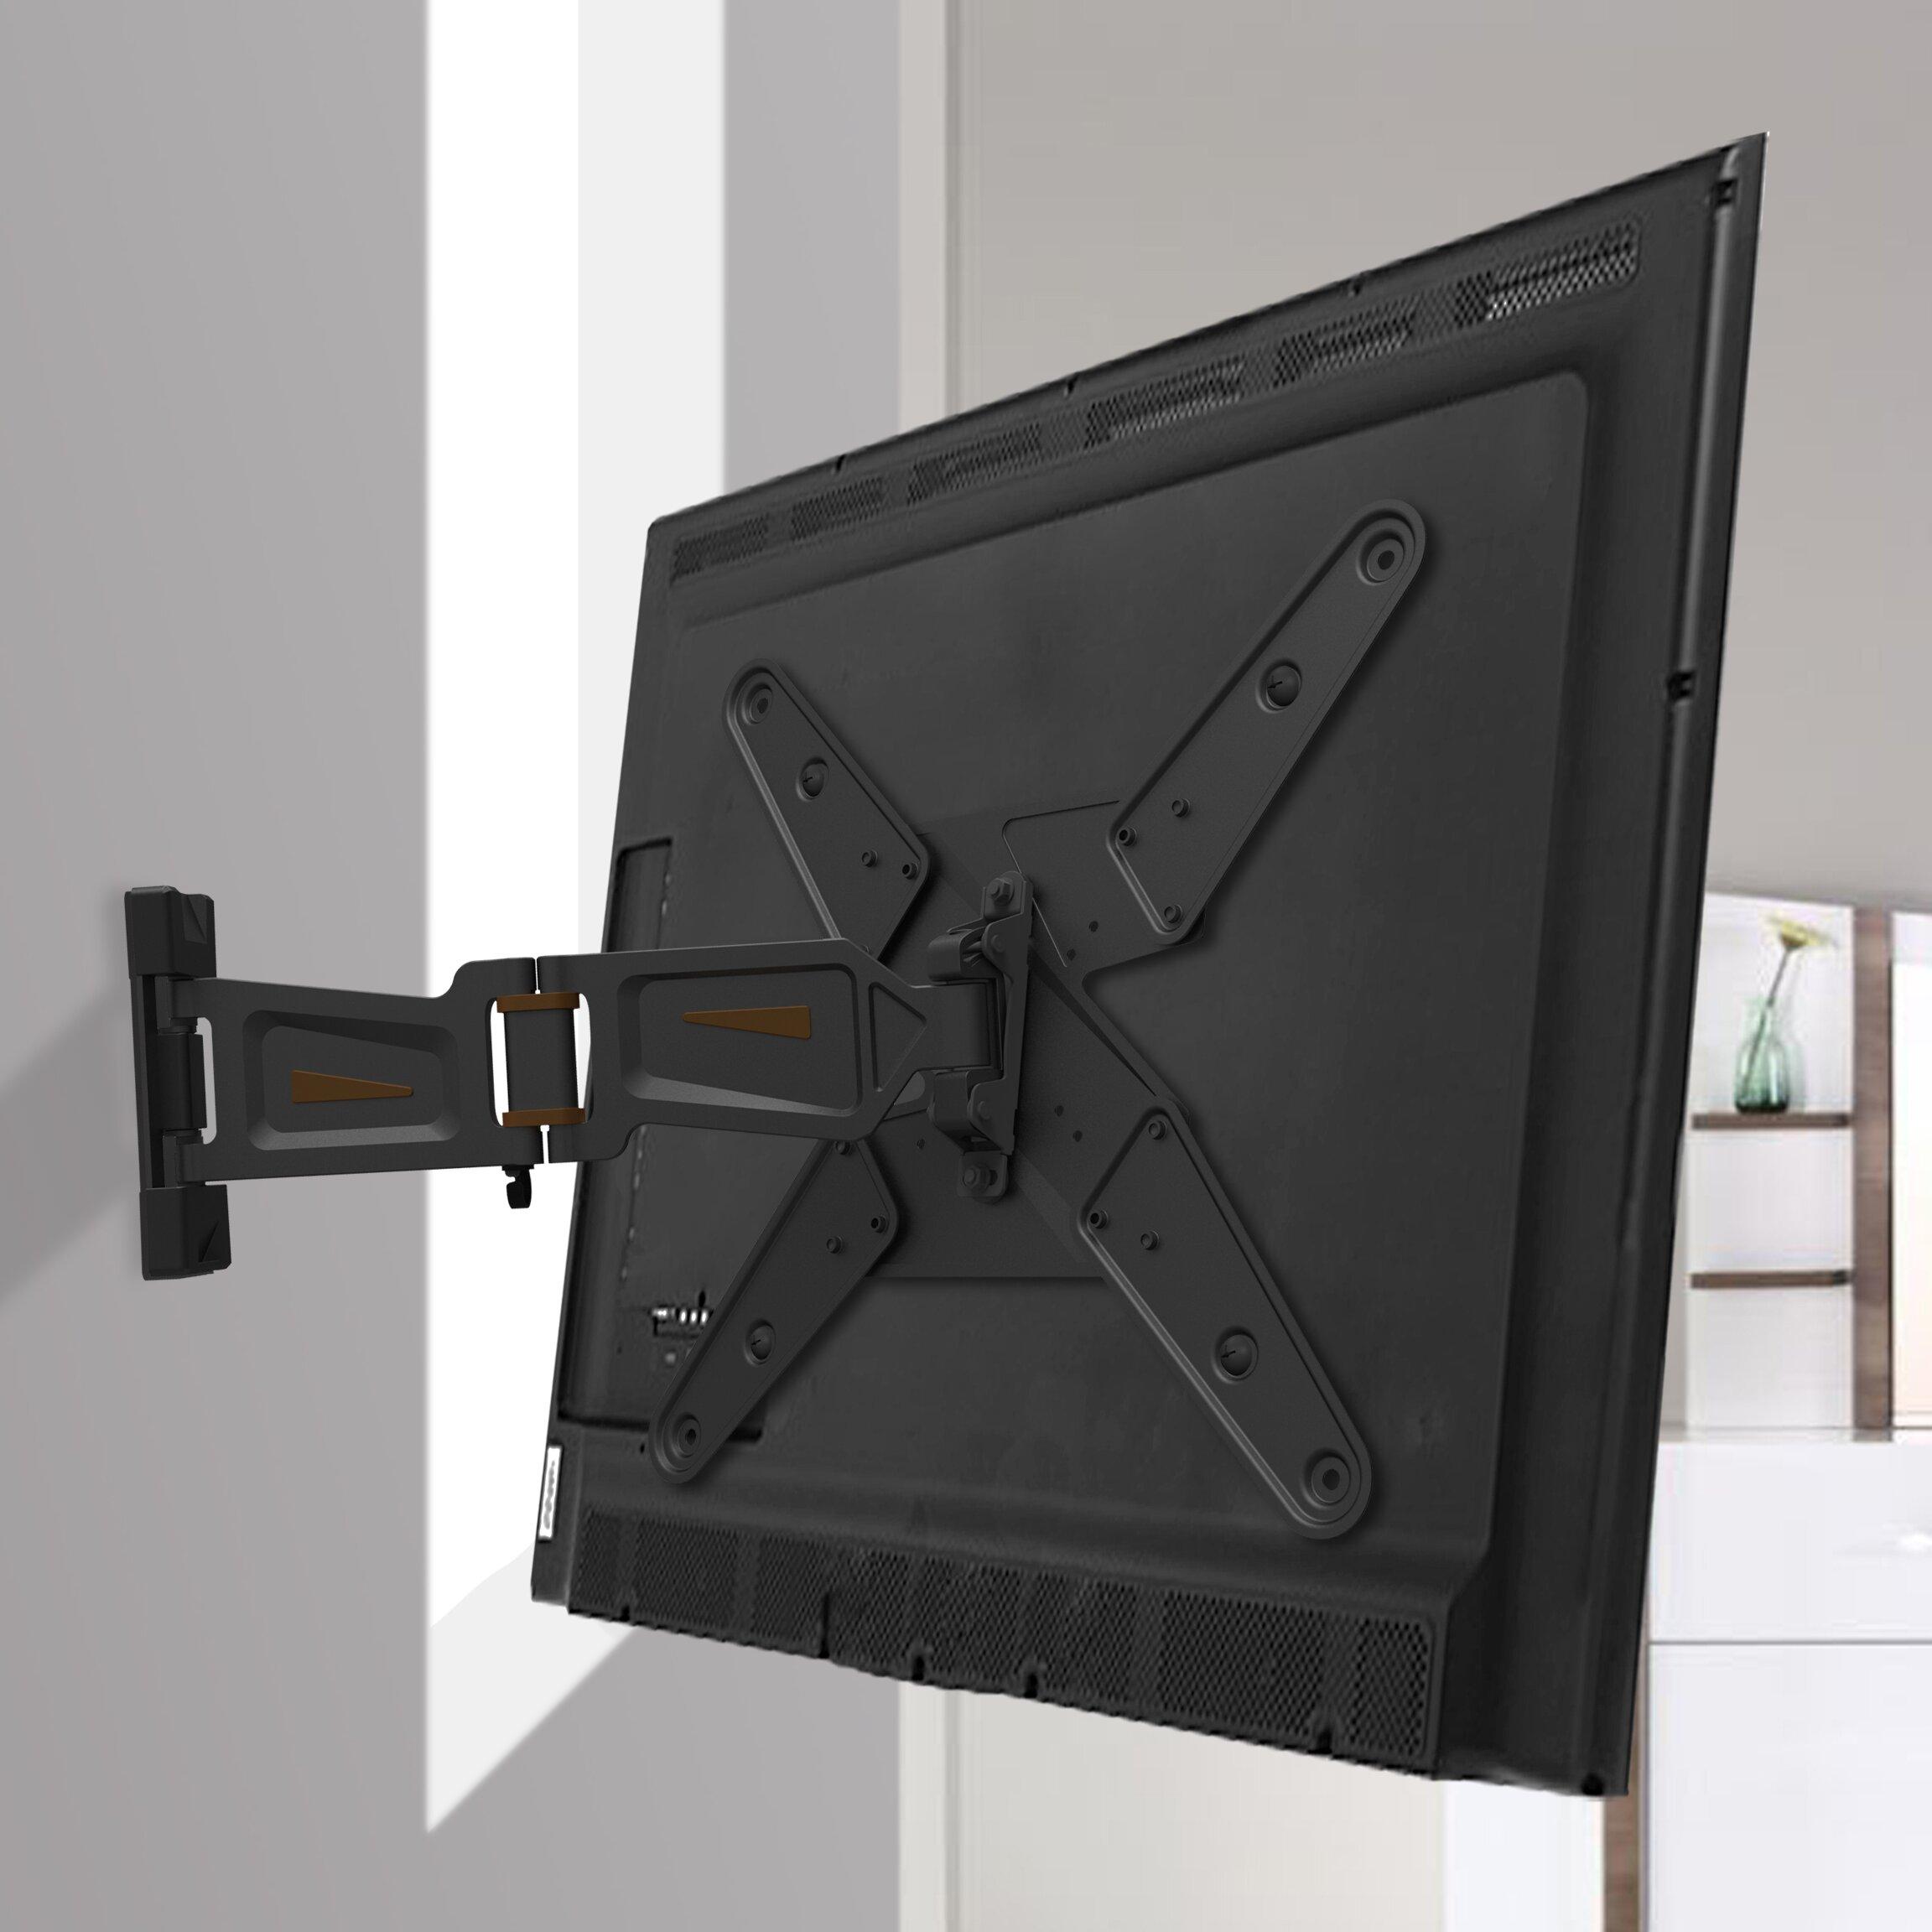 Gforce Full Motion Tv Wall Mount For 23 55 Flat Panel